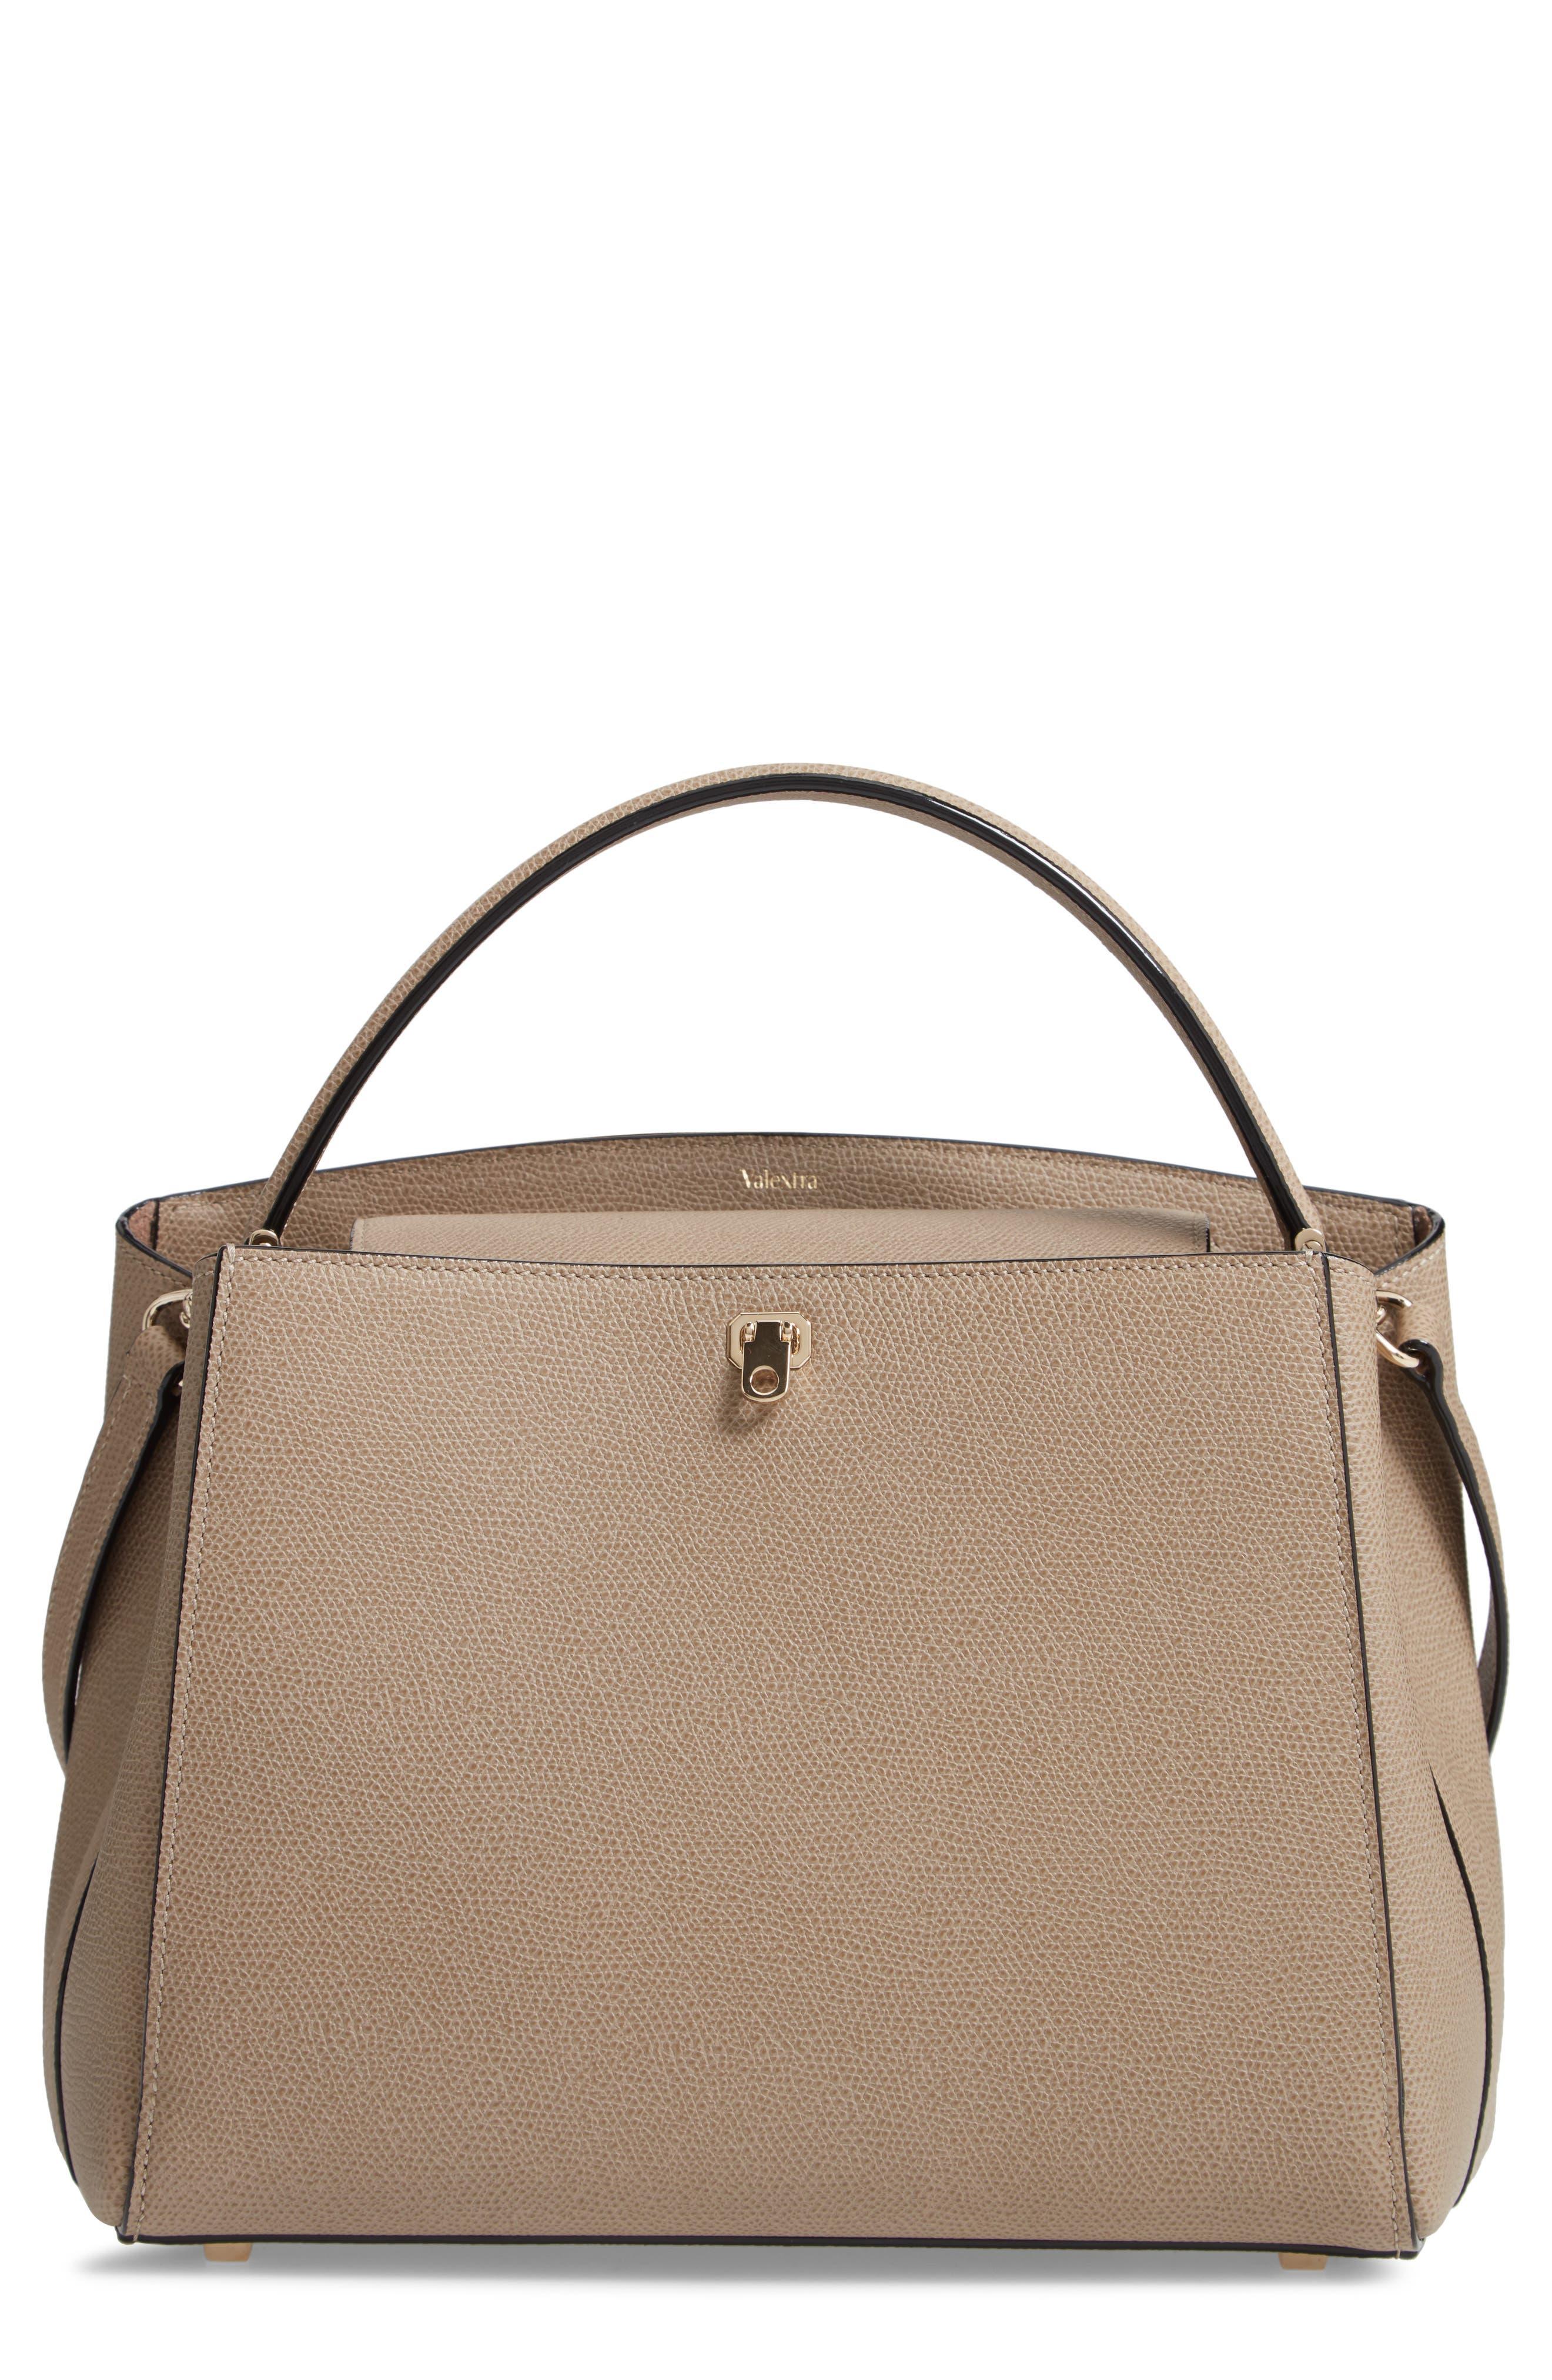 Medium Brera Leather Top Handle Bag - Beige in Oyster